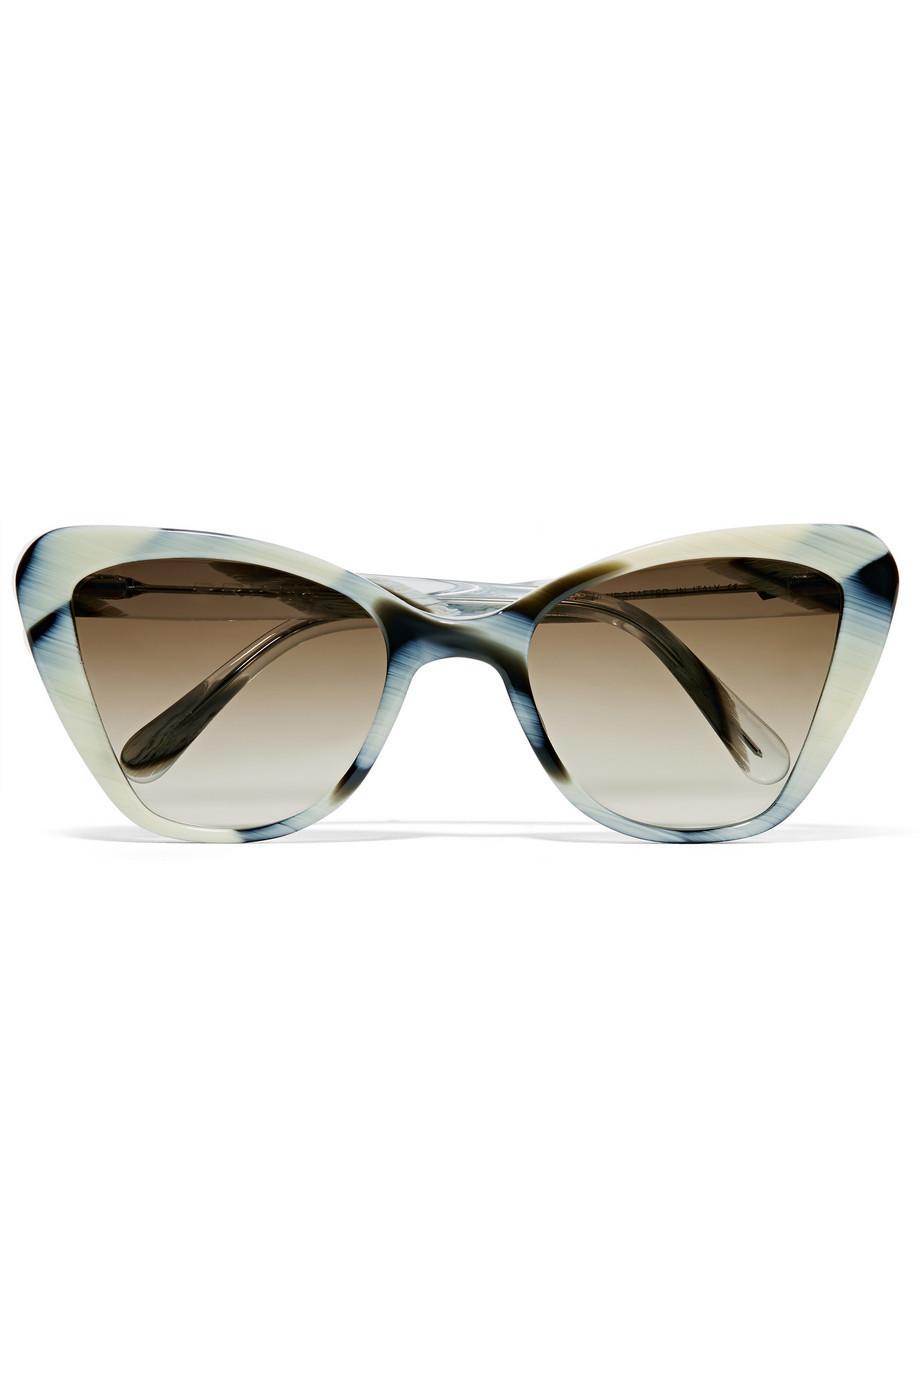 d59fcf49b85e TopShop Handmade Premium Acetate Cat Eye Sunglasses - White - Wheretoget